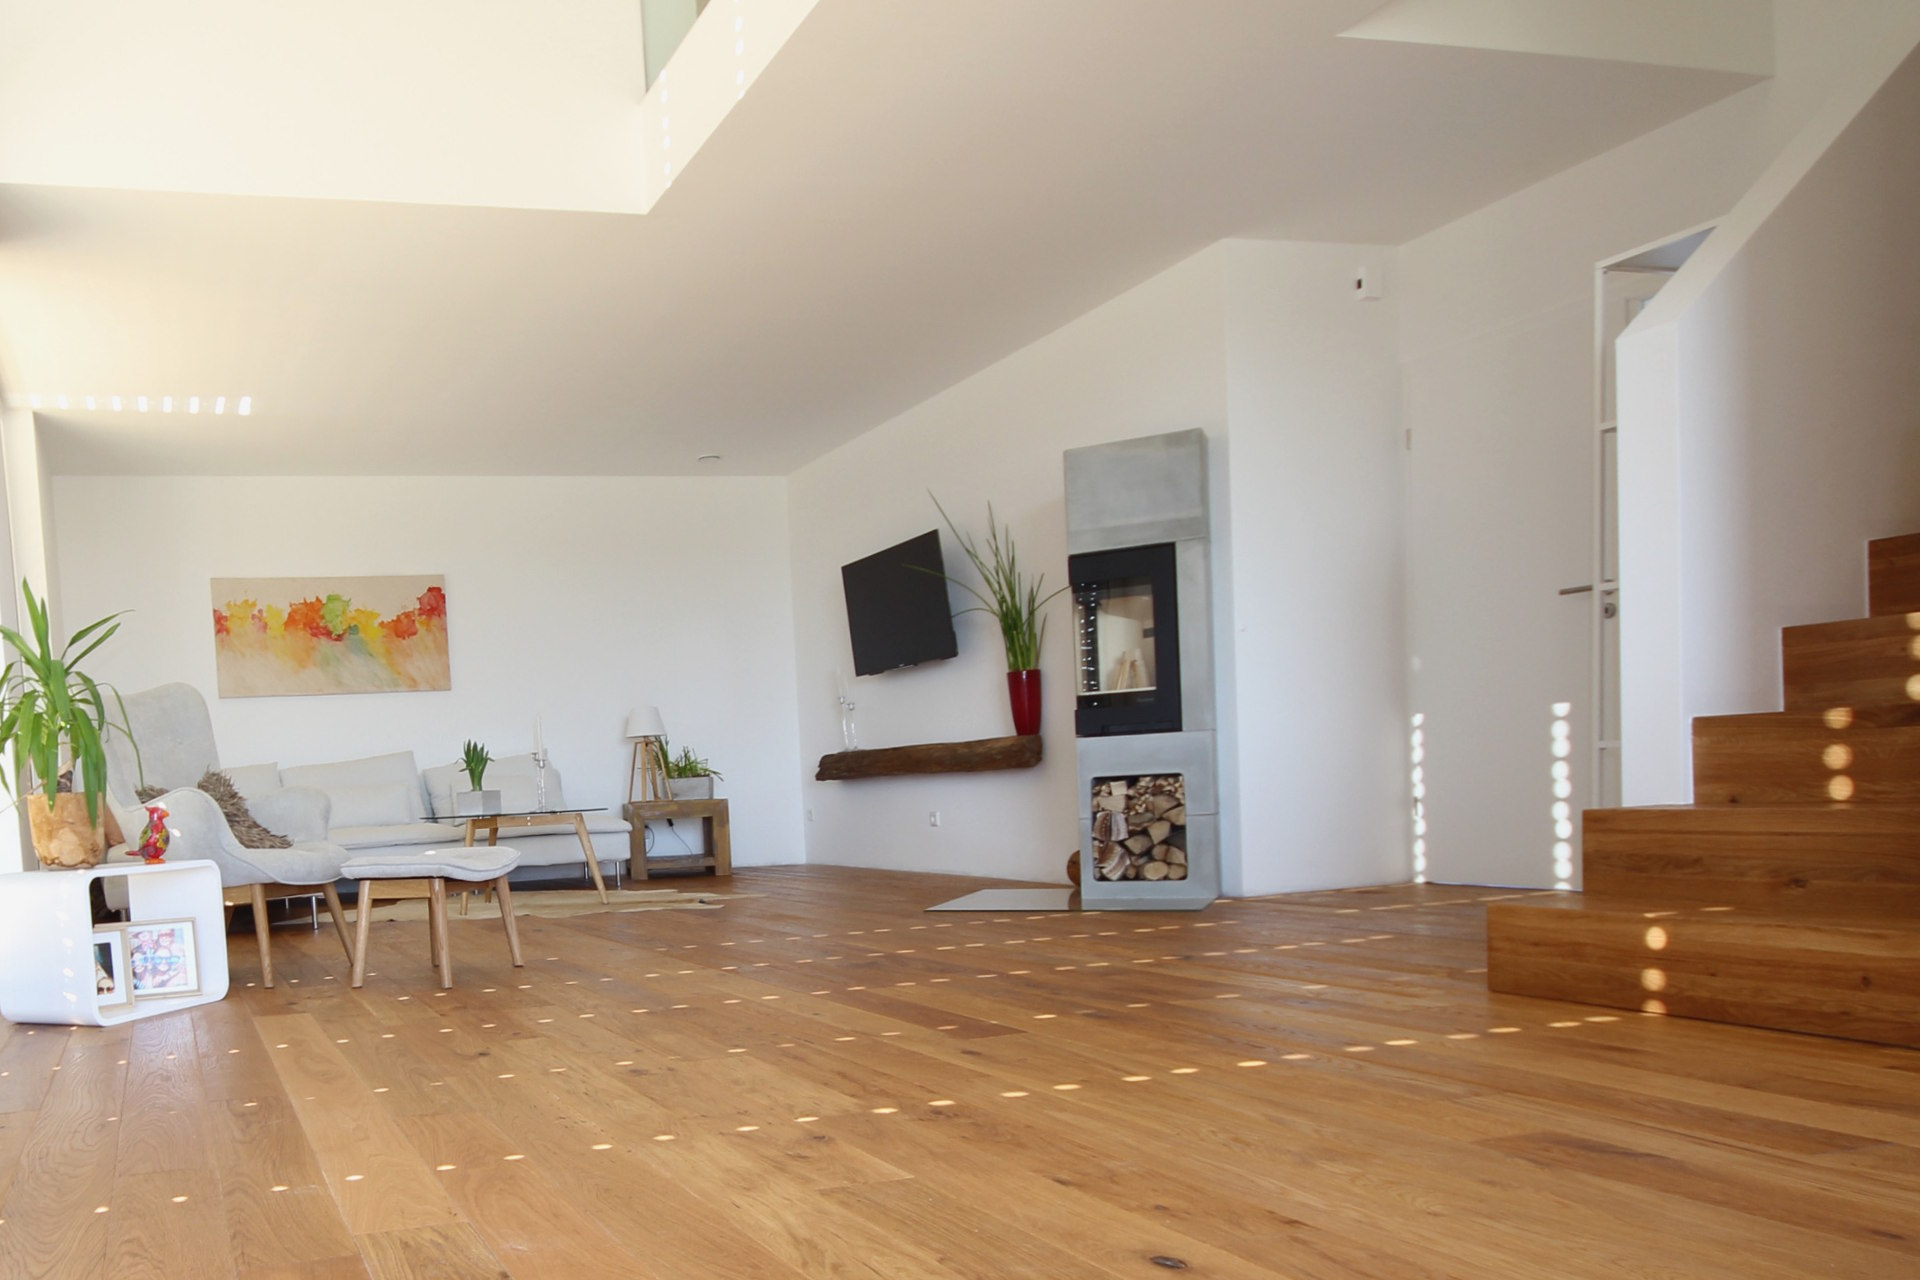 Holzboden-Massivholzdiele-Eiche-Lingen-04